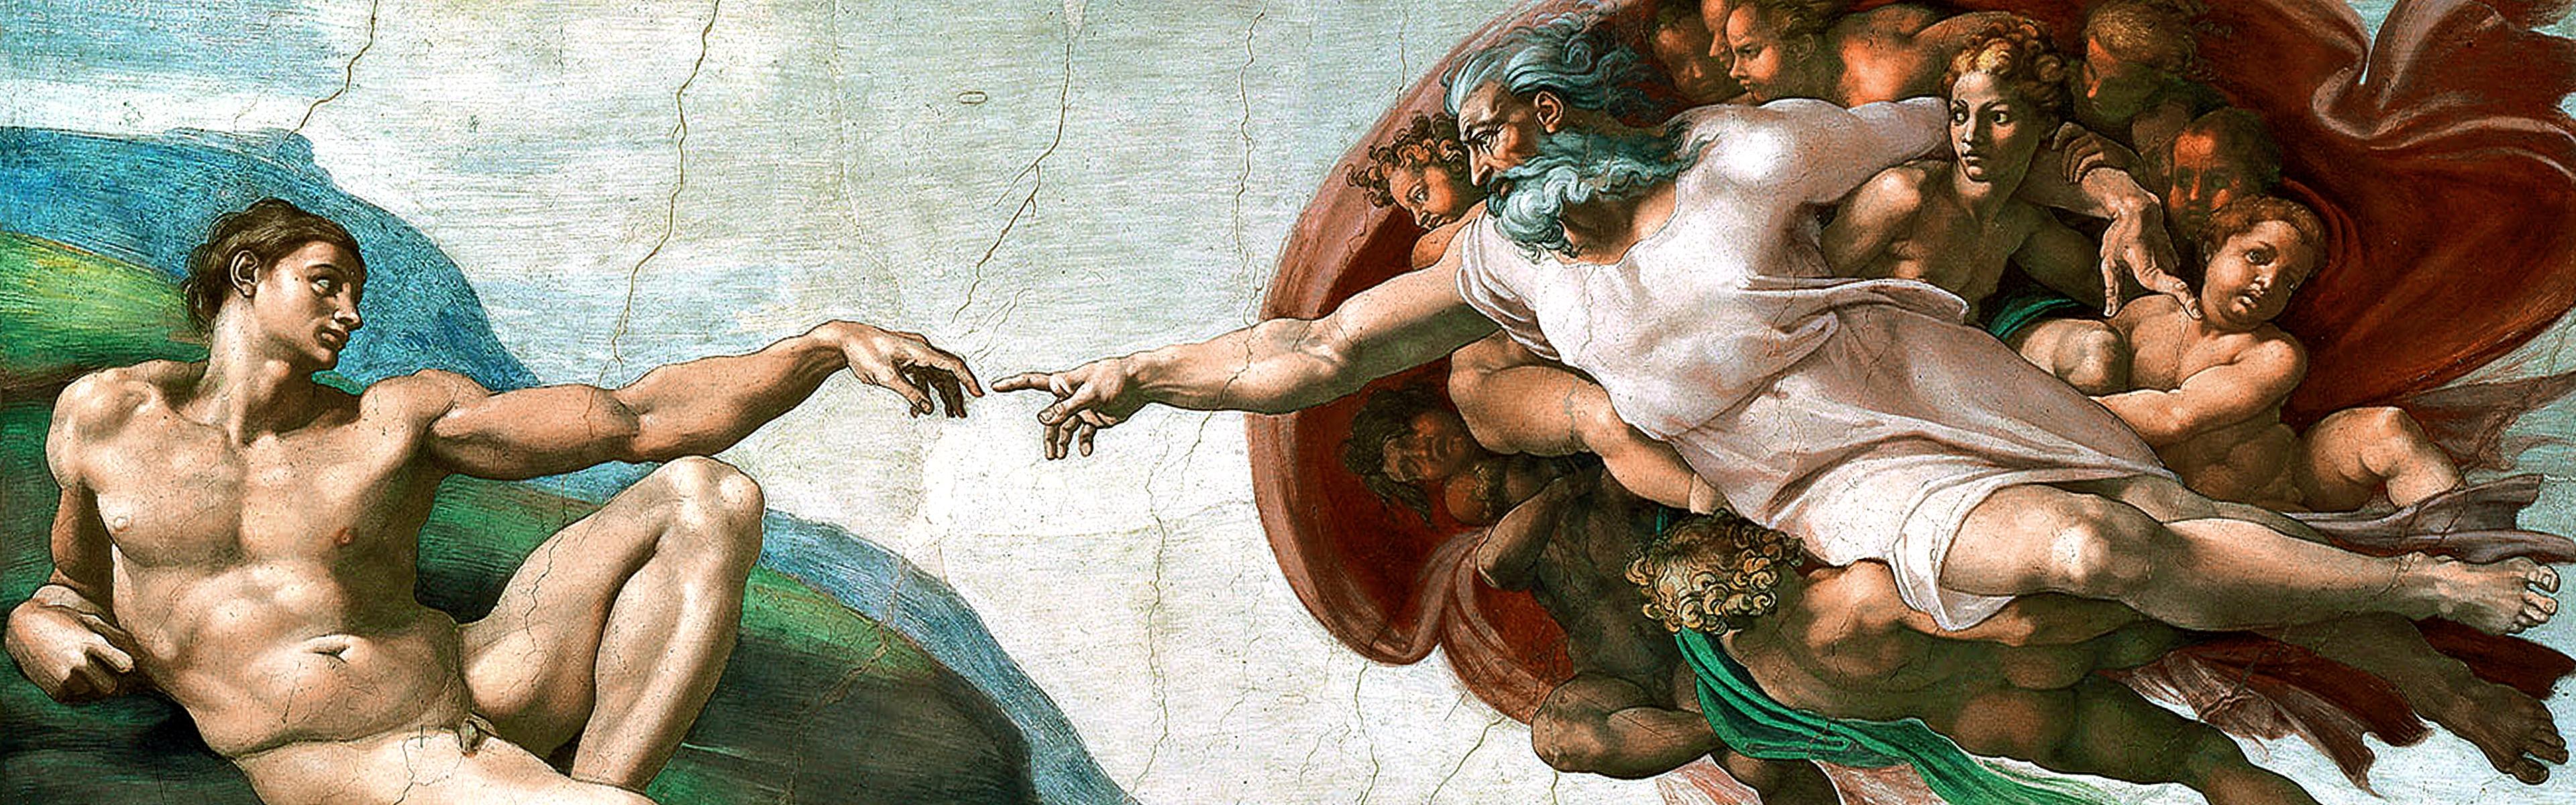 paintings michelangelo the creation of adam sistine chapel_www.paperhi.com_16